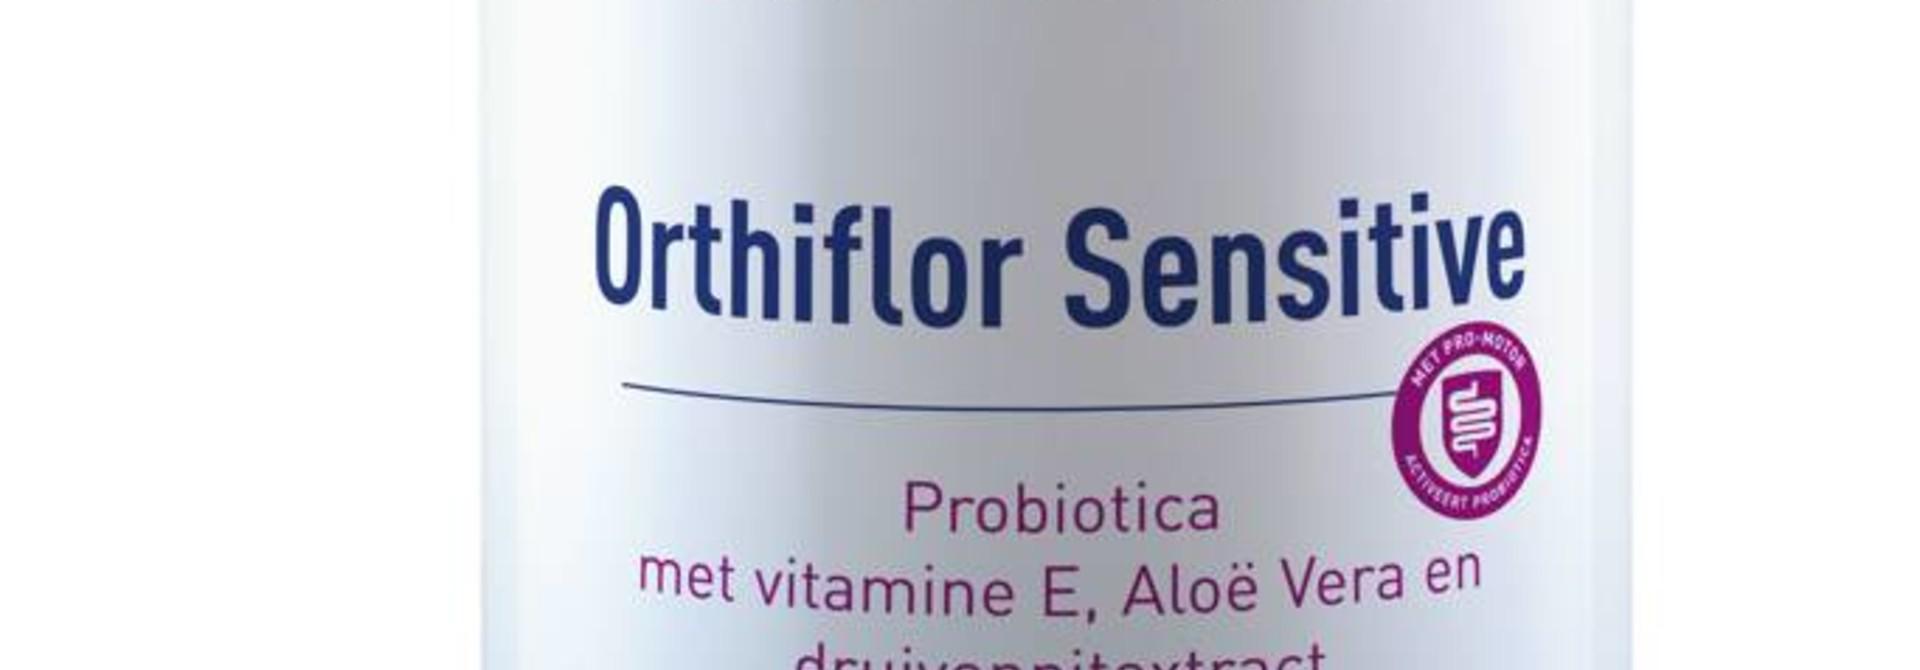 Orthiflor sensitive 80 gram